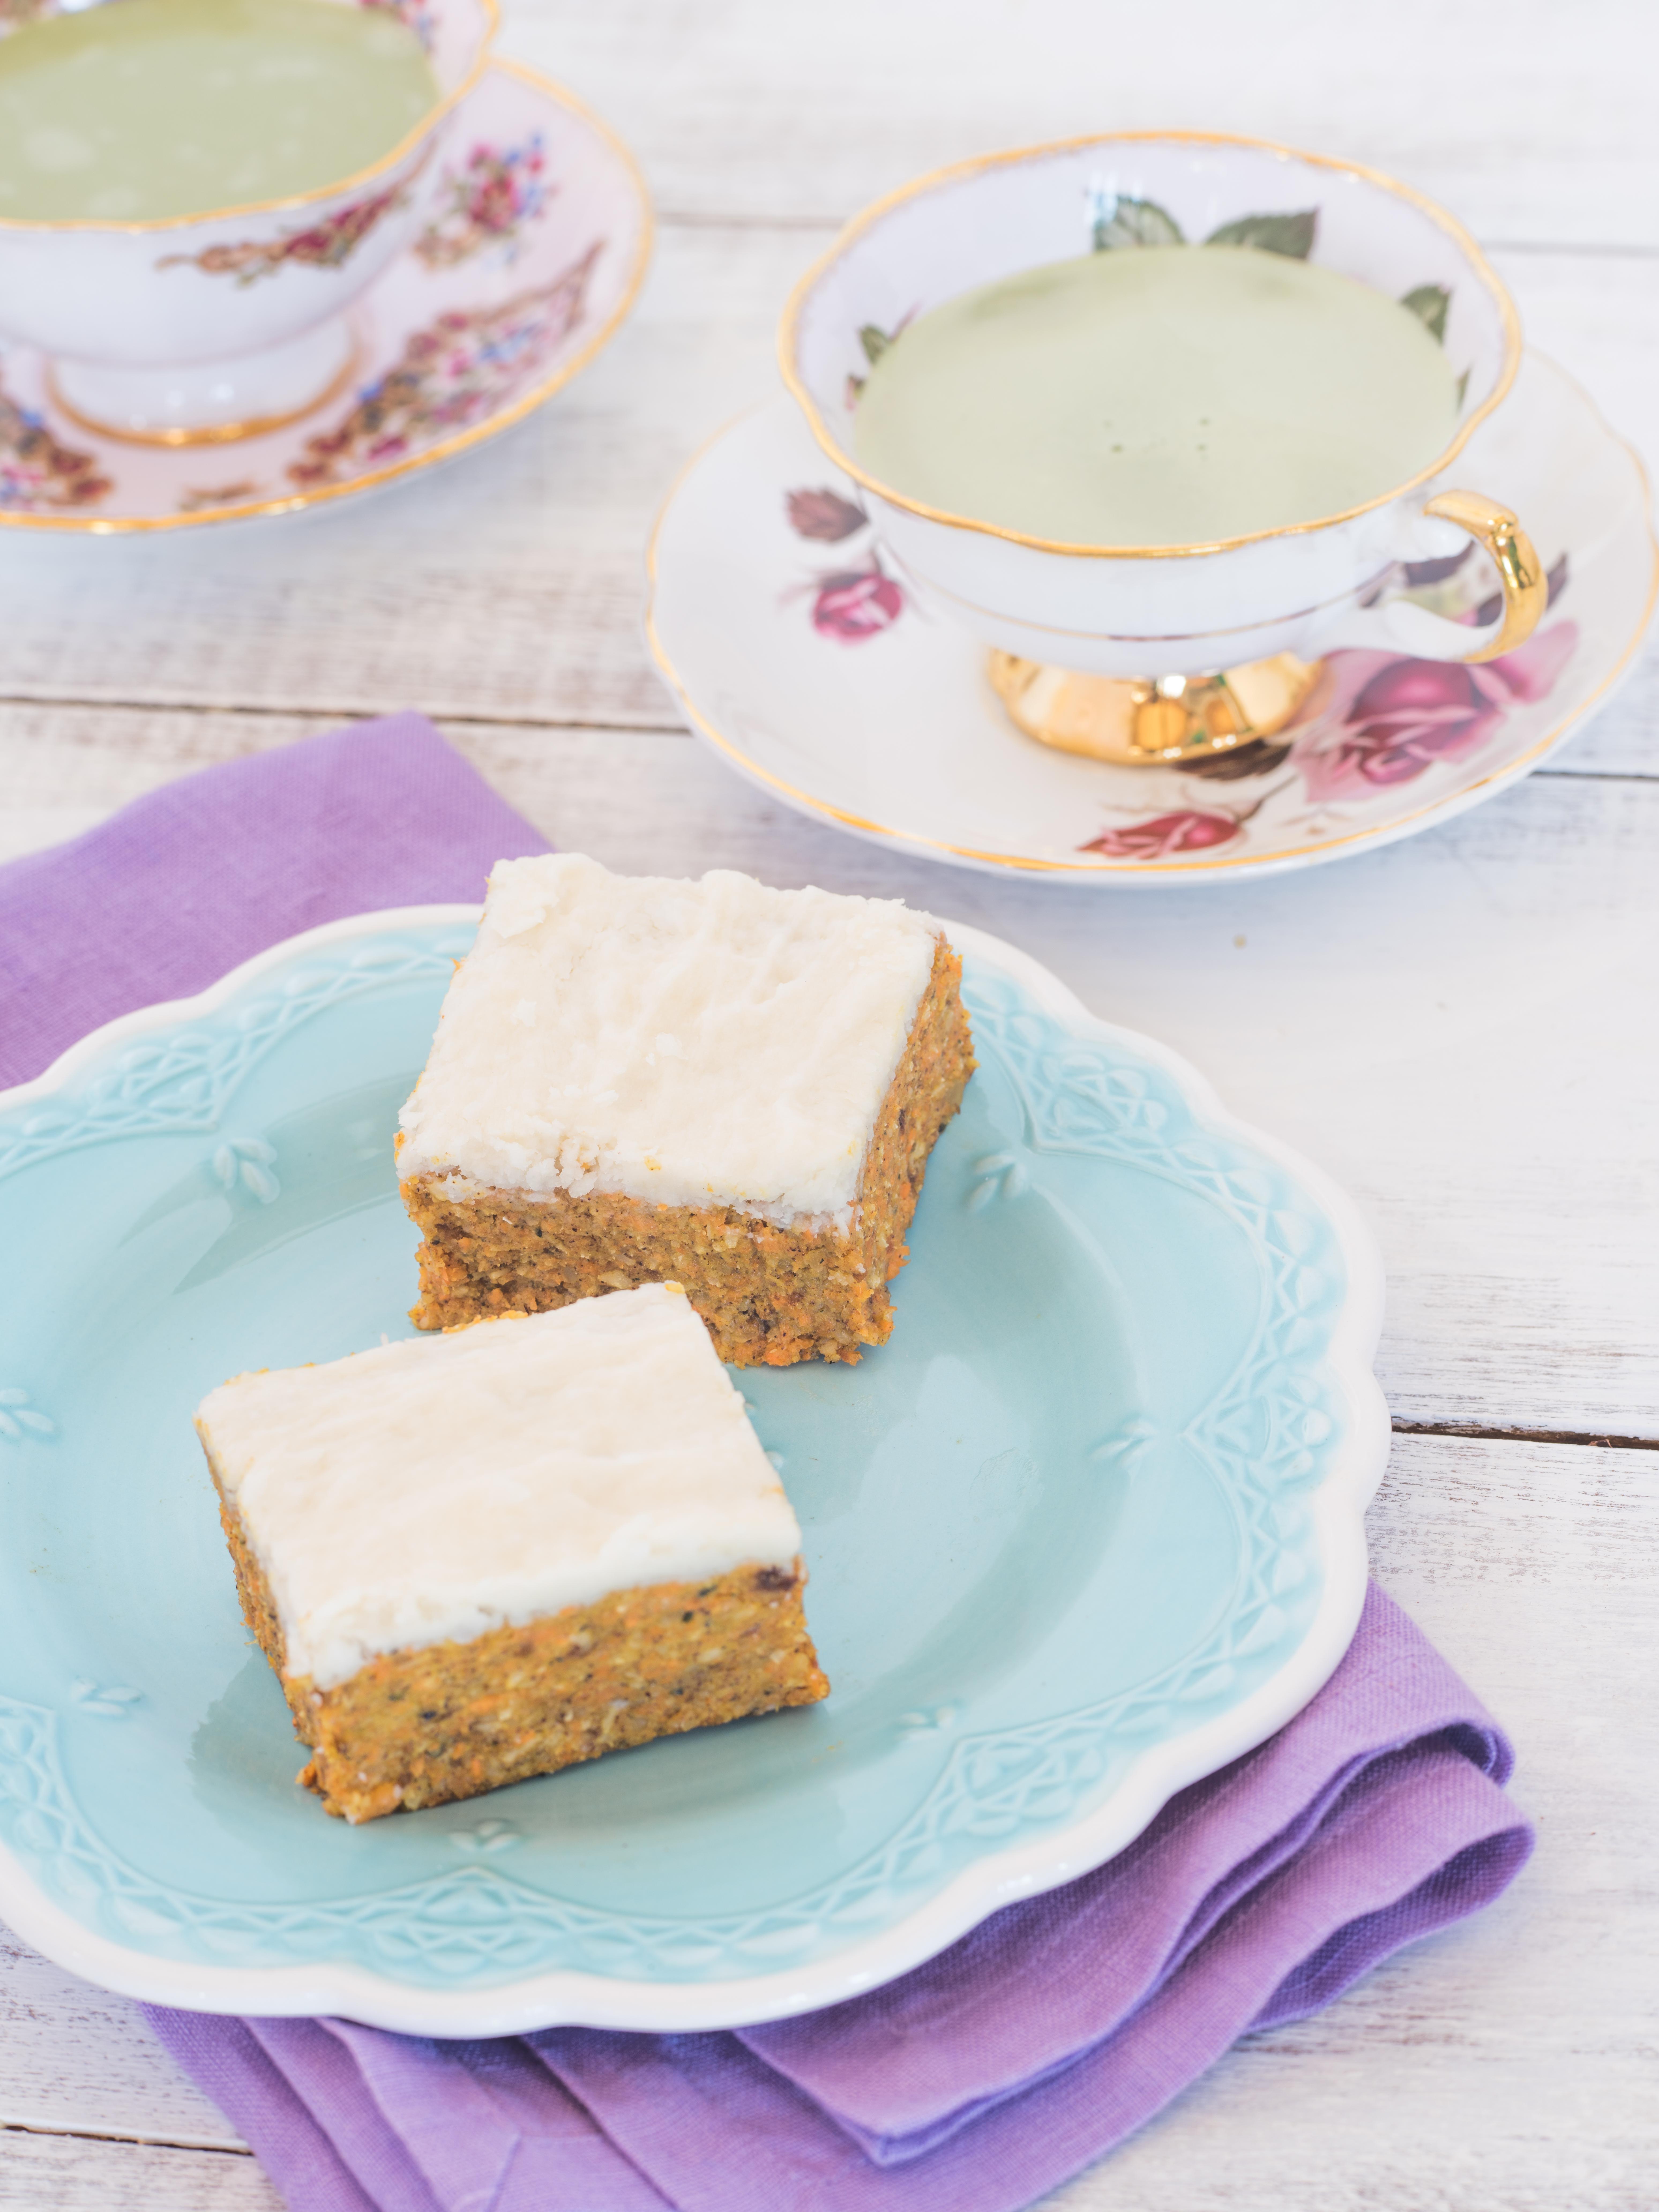 No-Bake Carrot Cake Squares + Joyous Detox Cookbook Giveaway!